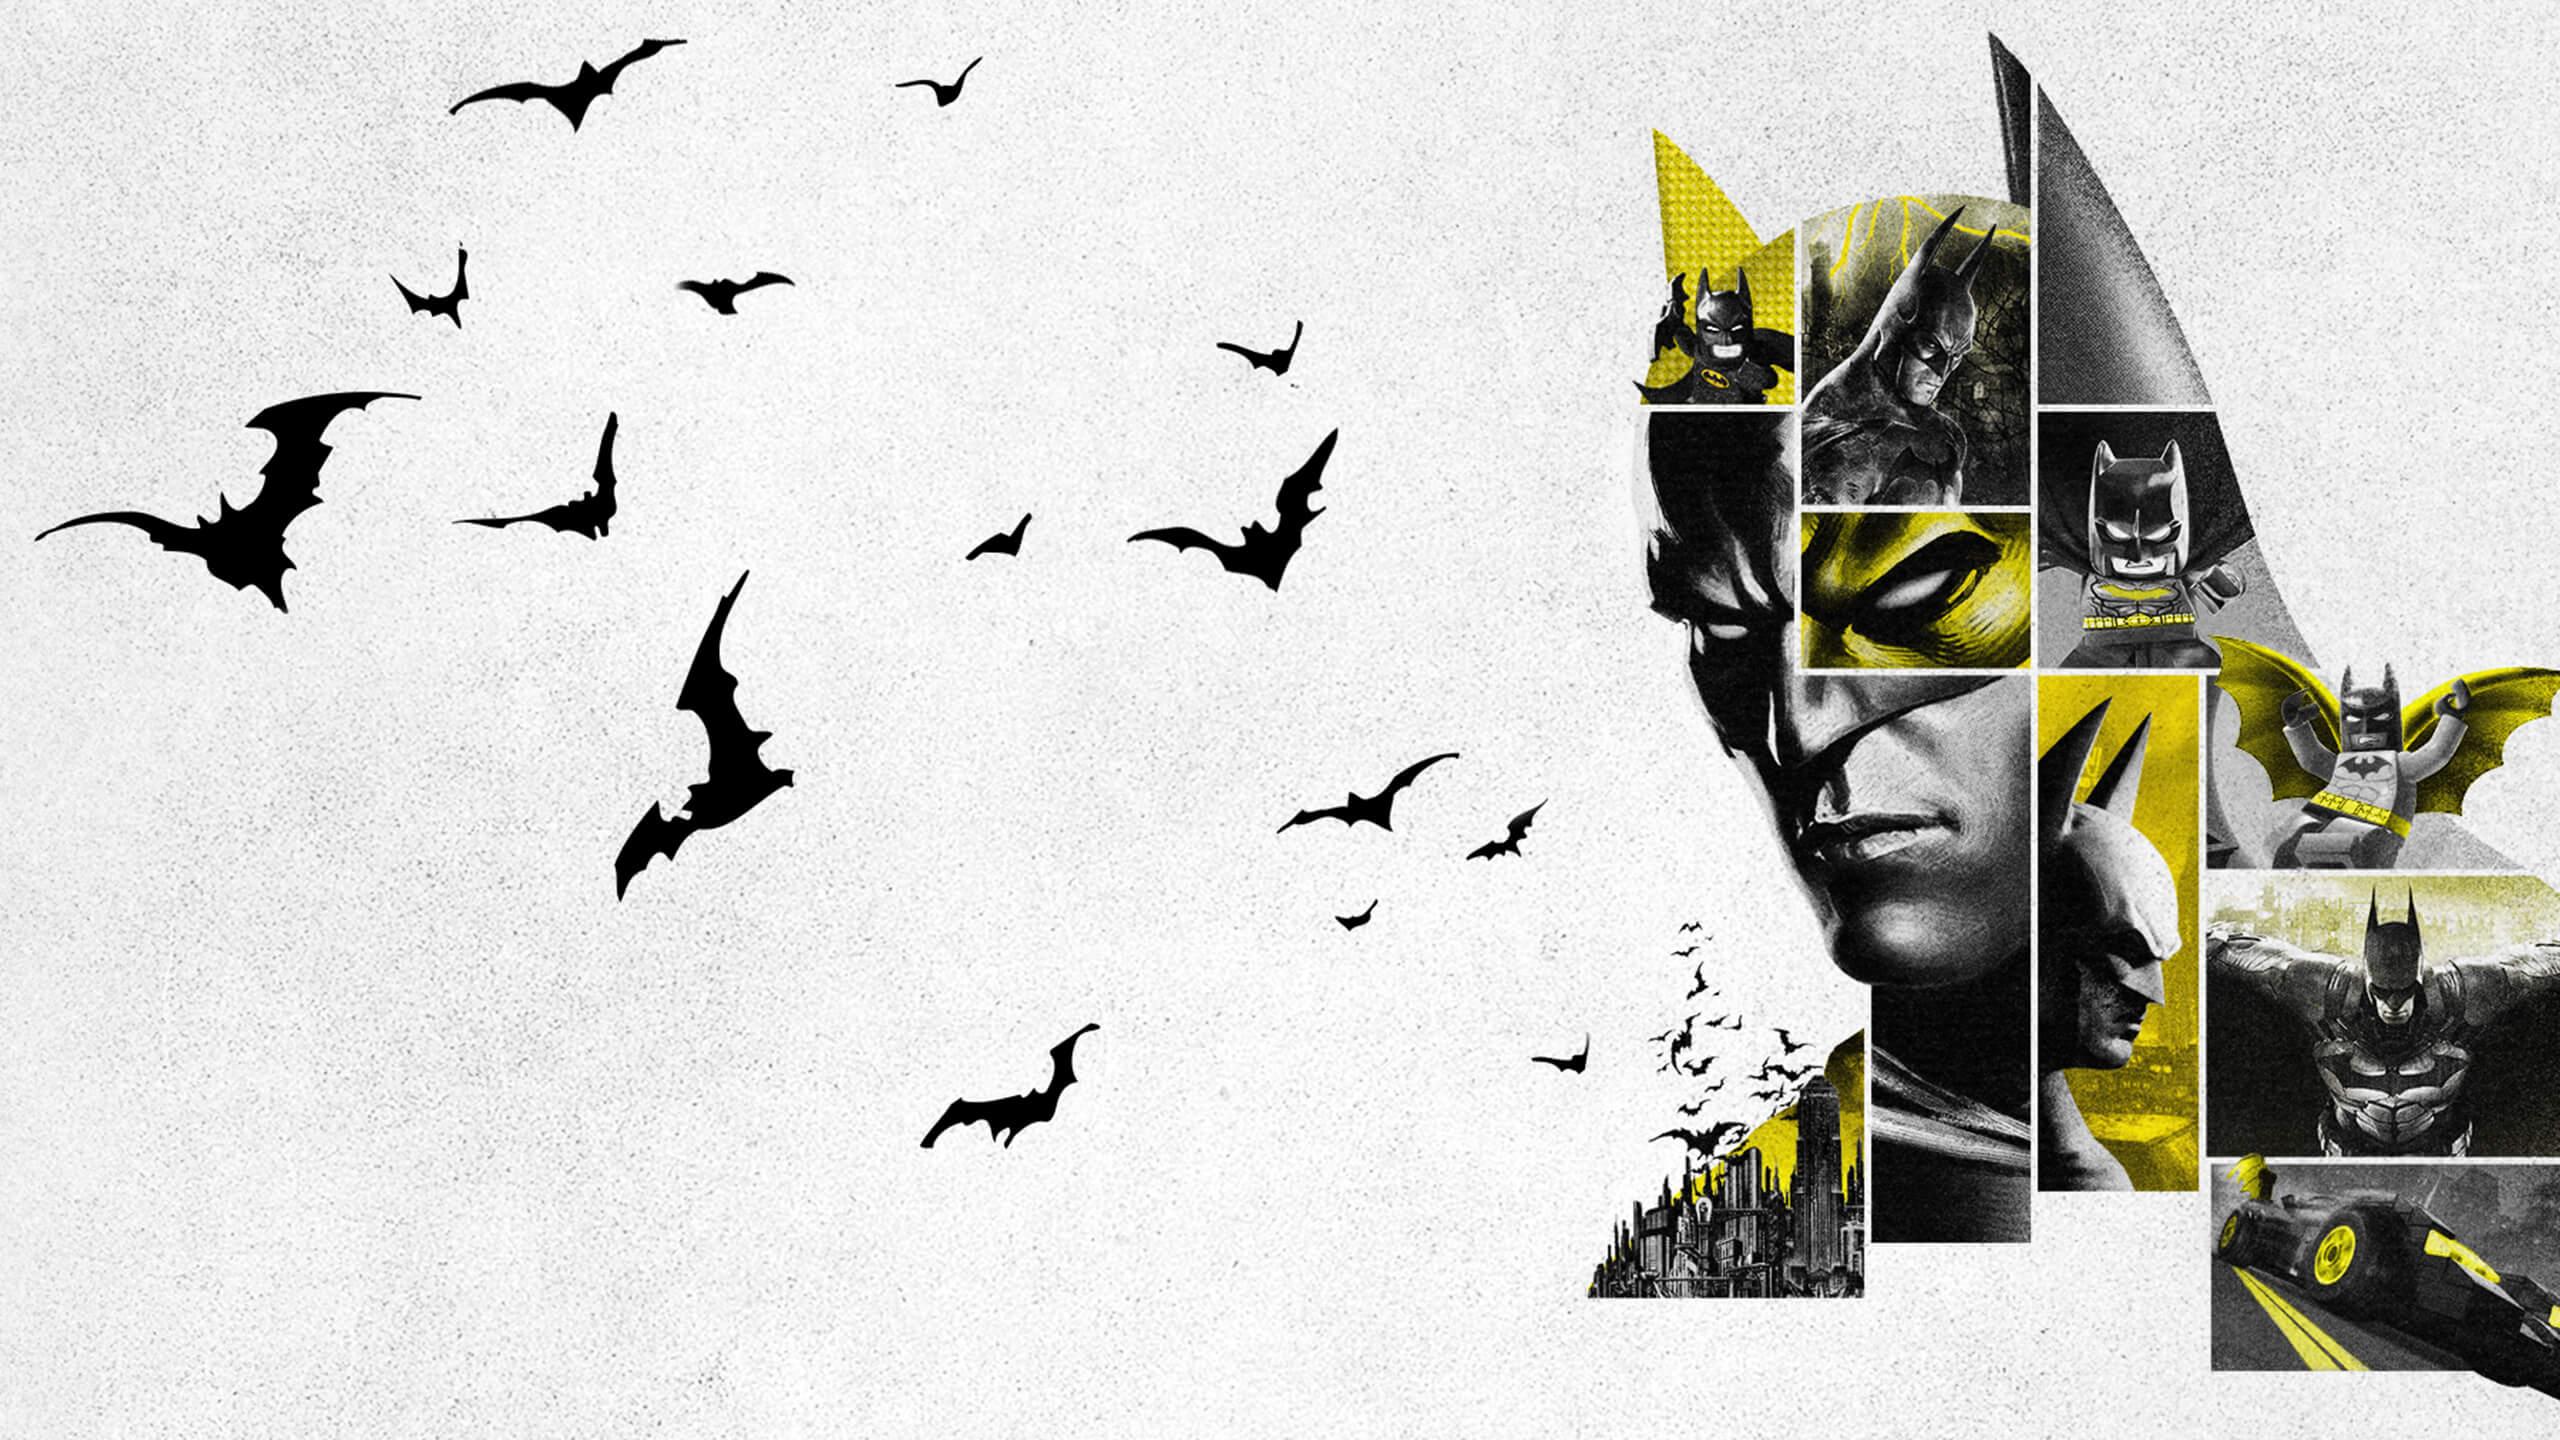 Diesel blog batman free games EGS Social Batman Free News 2560x1440 1a205cc357c51a04f7f ab8594c